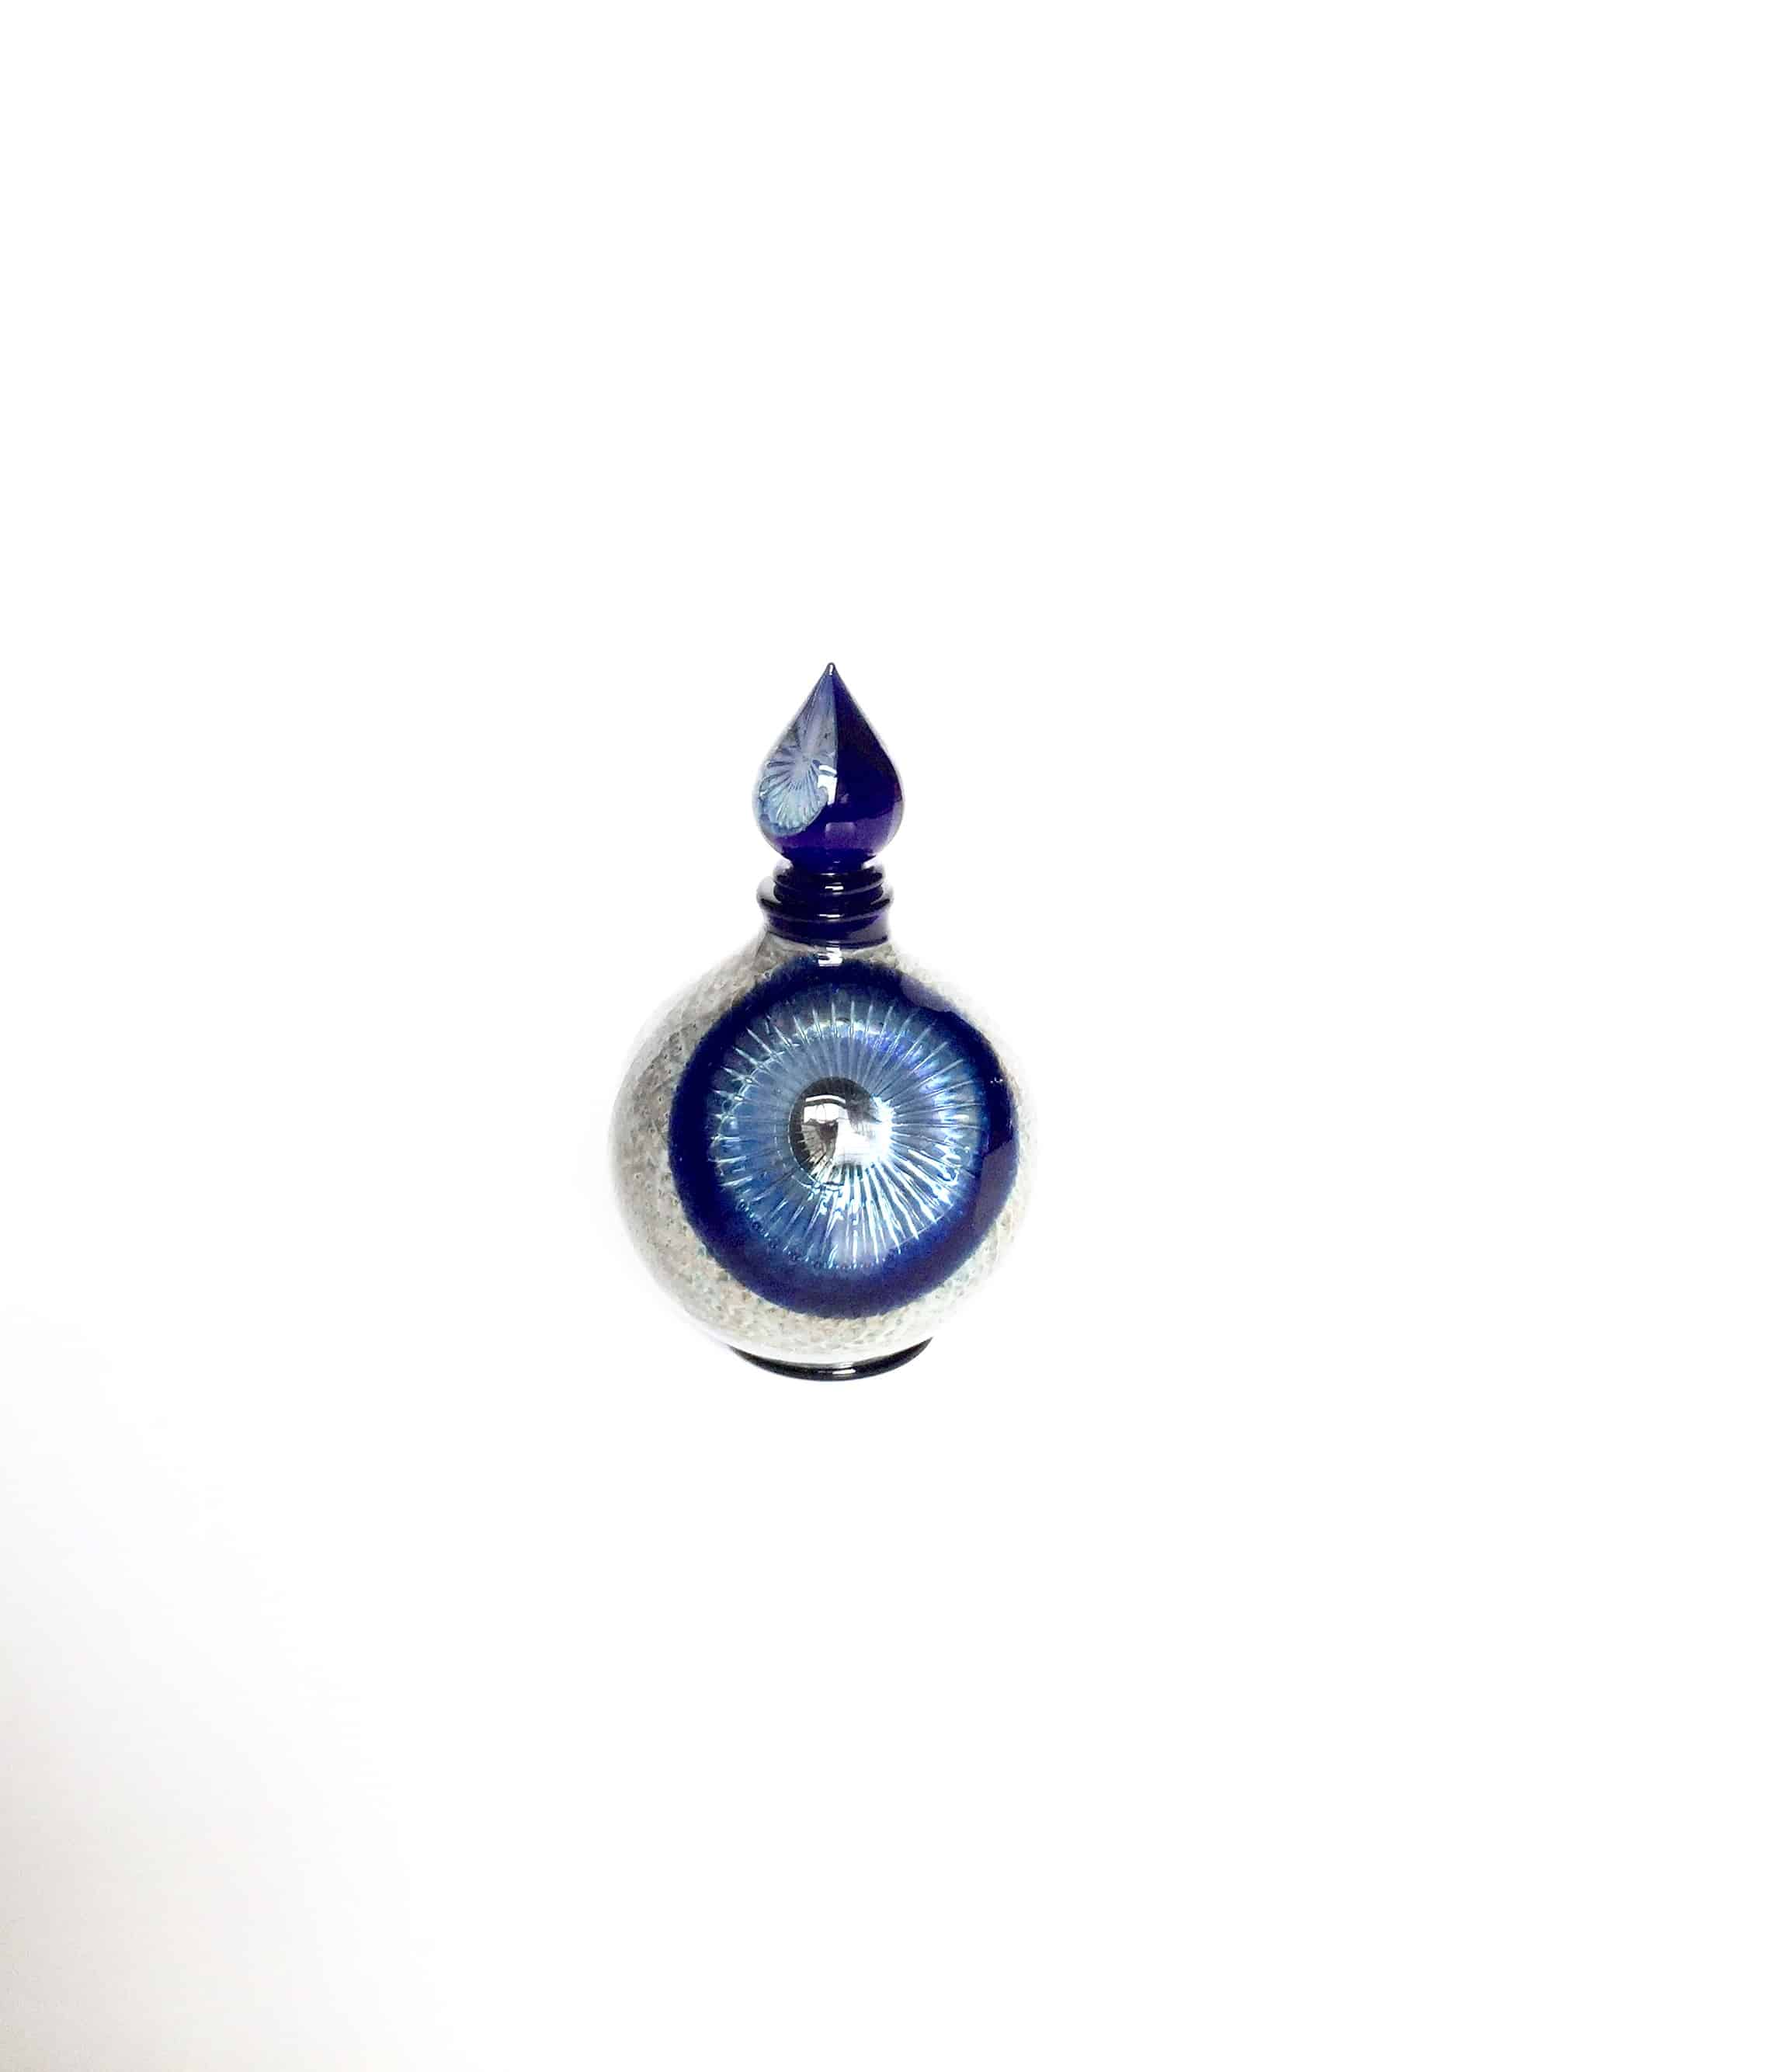 Richard-Clements-perfume-bottle-round-blue-dark-stopper